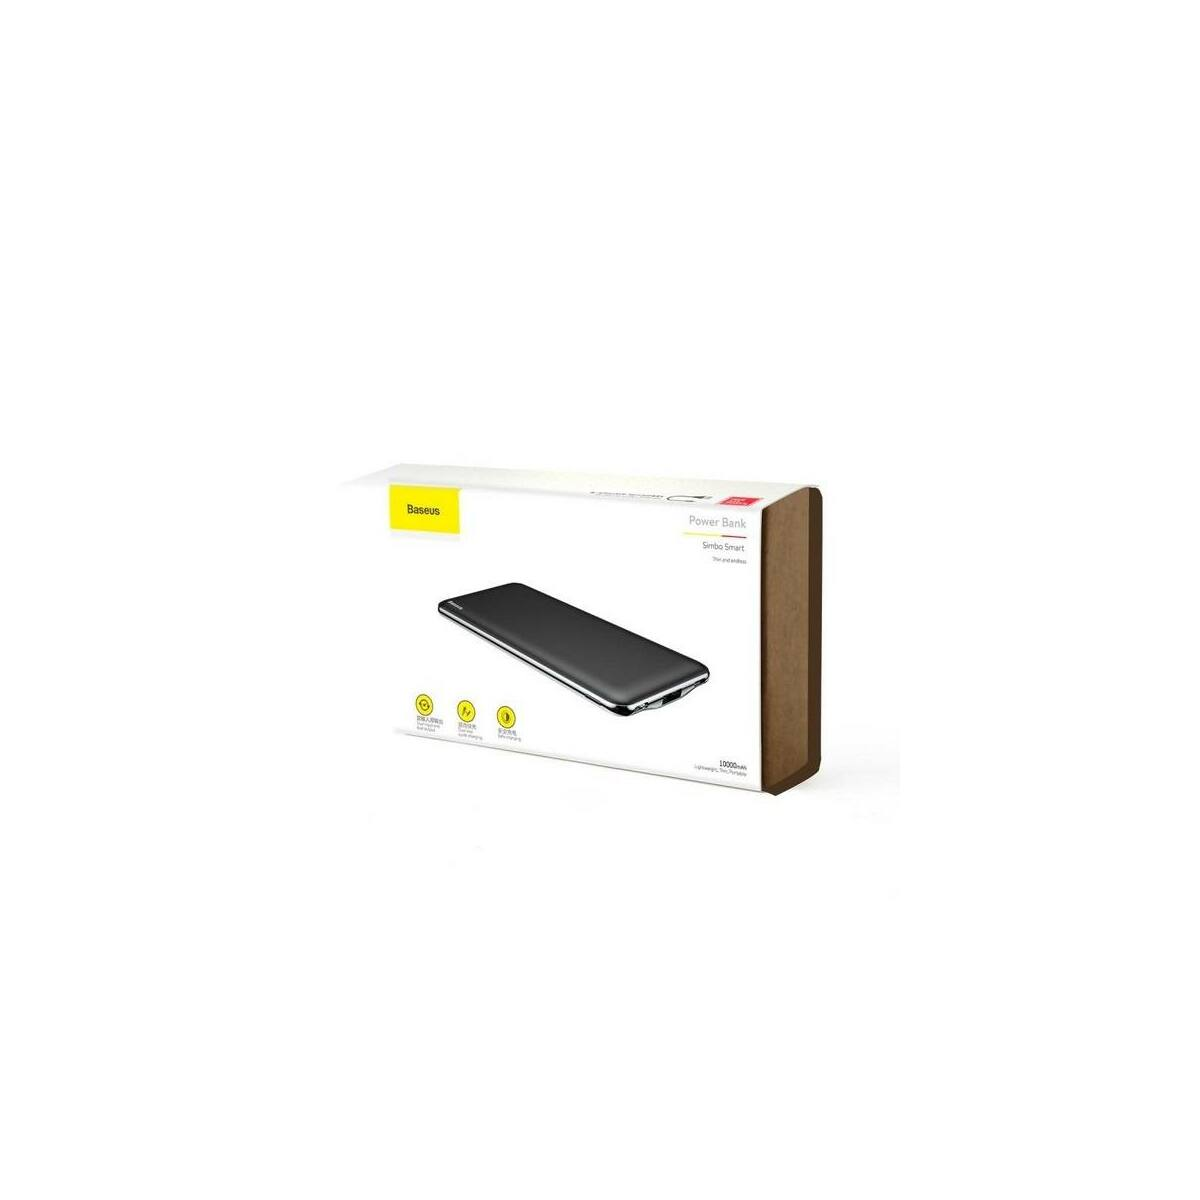 Baseus Power Bank Simbo (Type-C + Lightning bemenet / TC + USB kimenet 5V 3A, 50cm Type-C kábel) 10.000 mAh, fekete (PPALL-QB01)